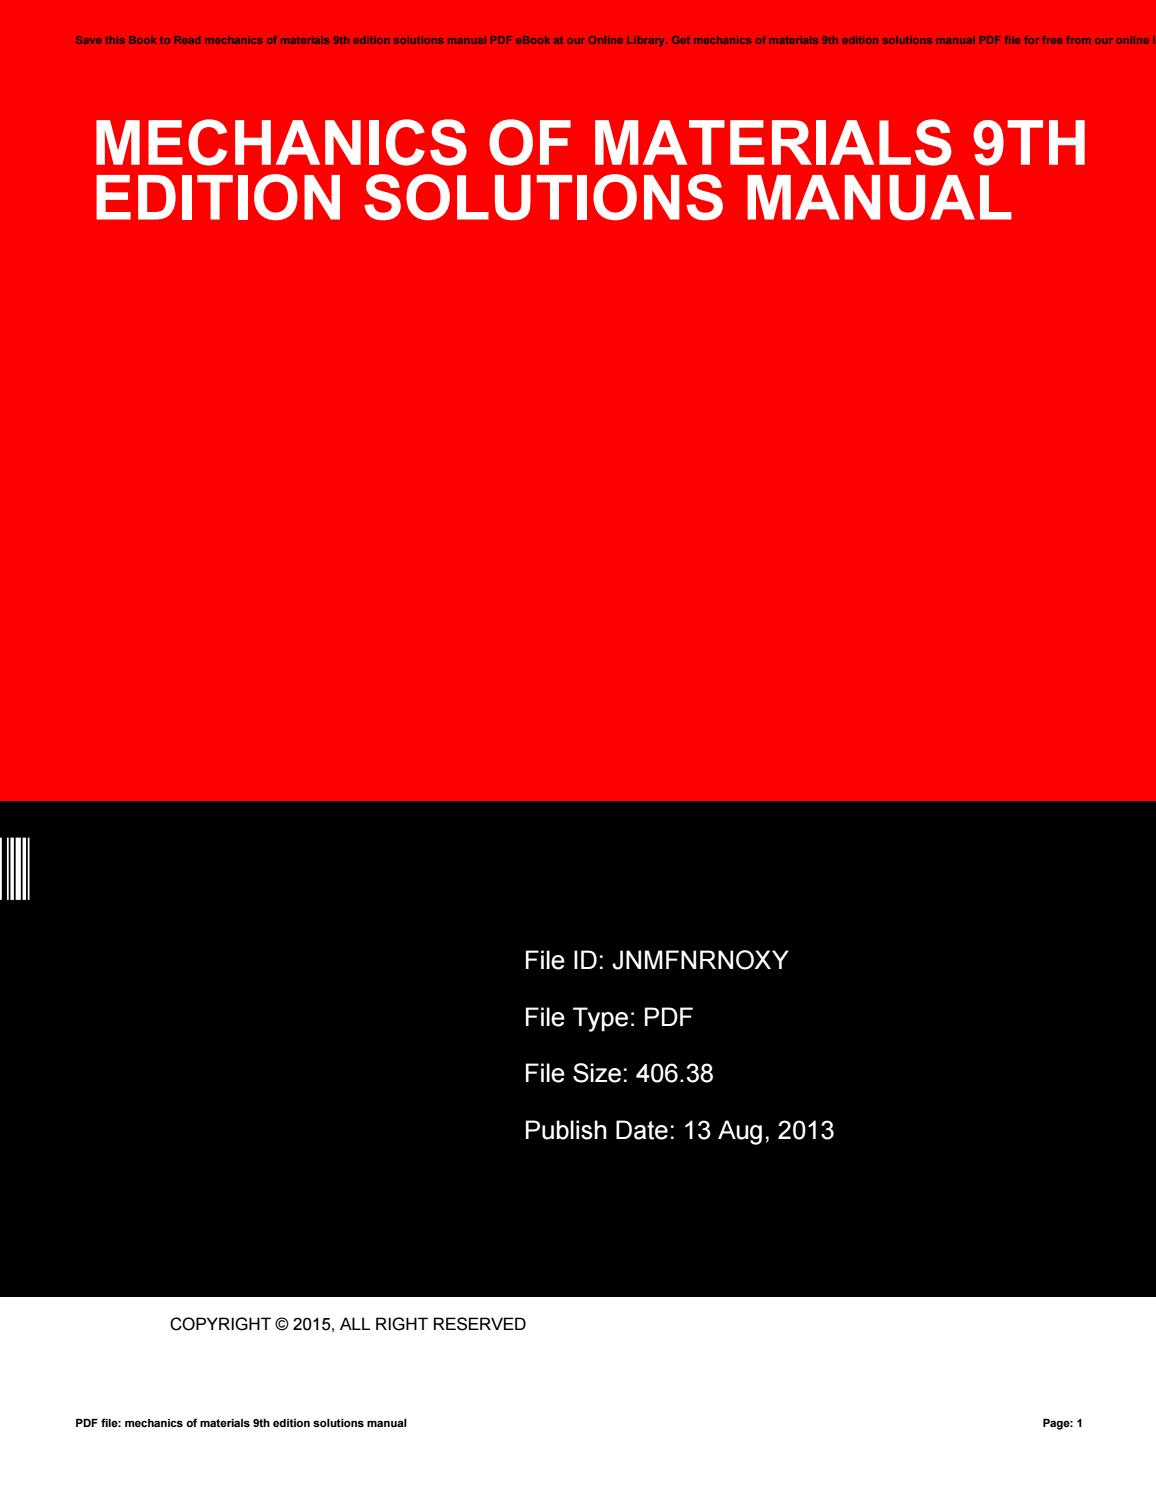 Mechanics Of Materials 9th Edition Pdf